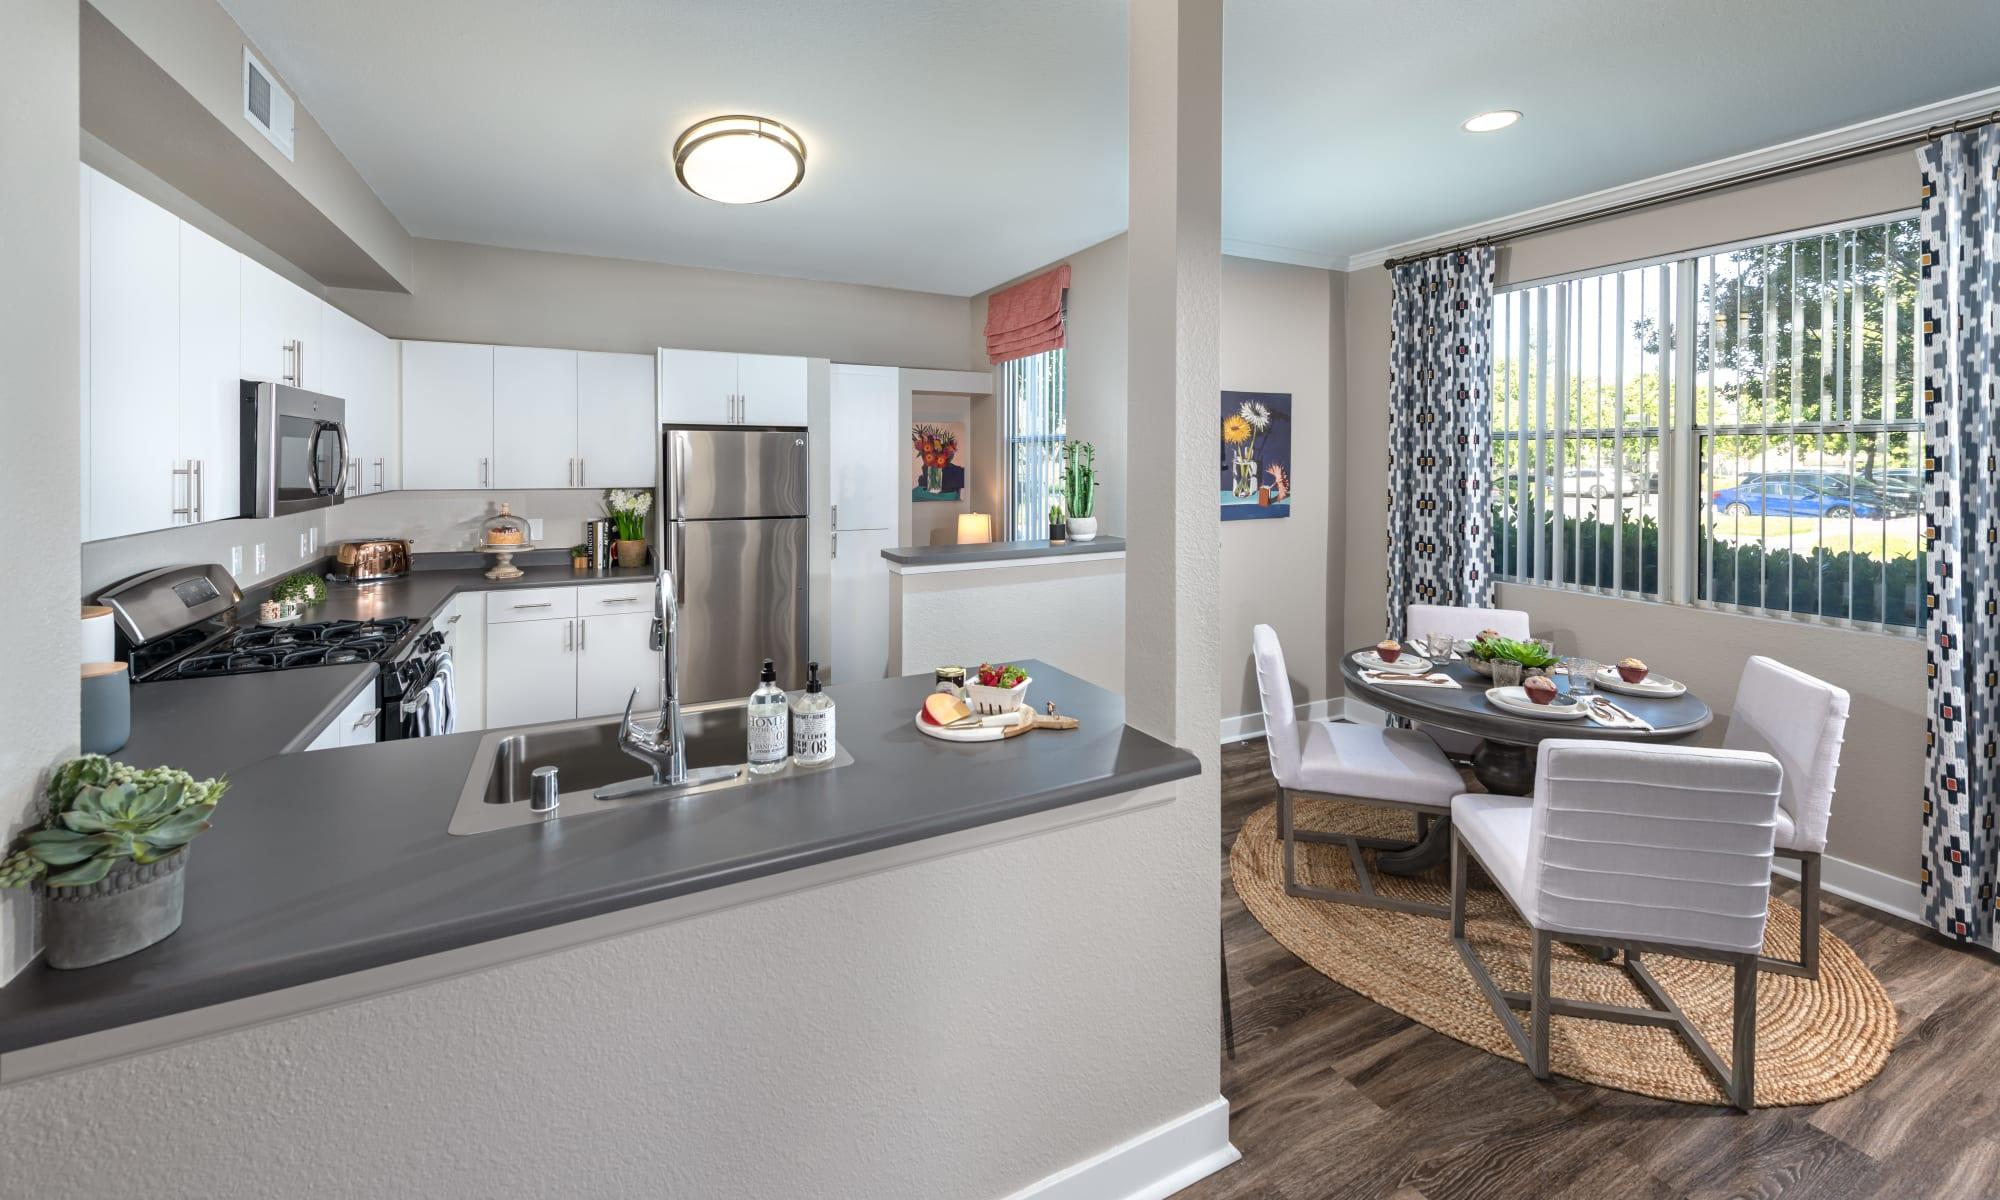 Photos of Park Hacienda Apartments in Pleasanton, California